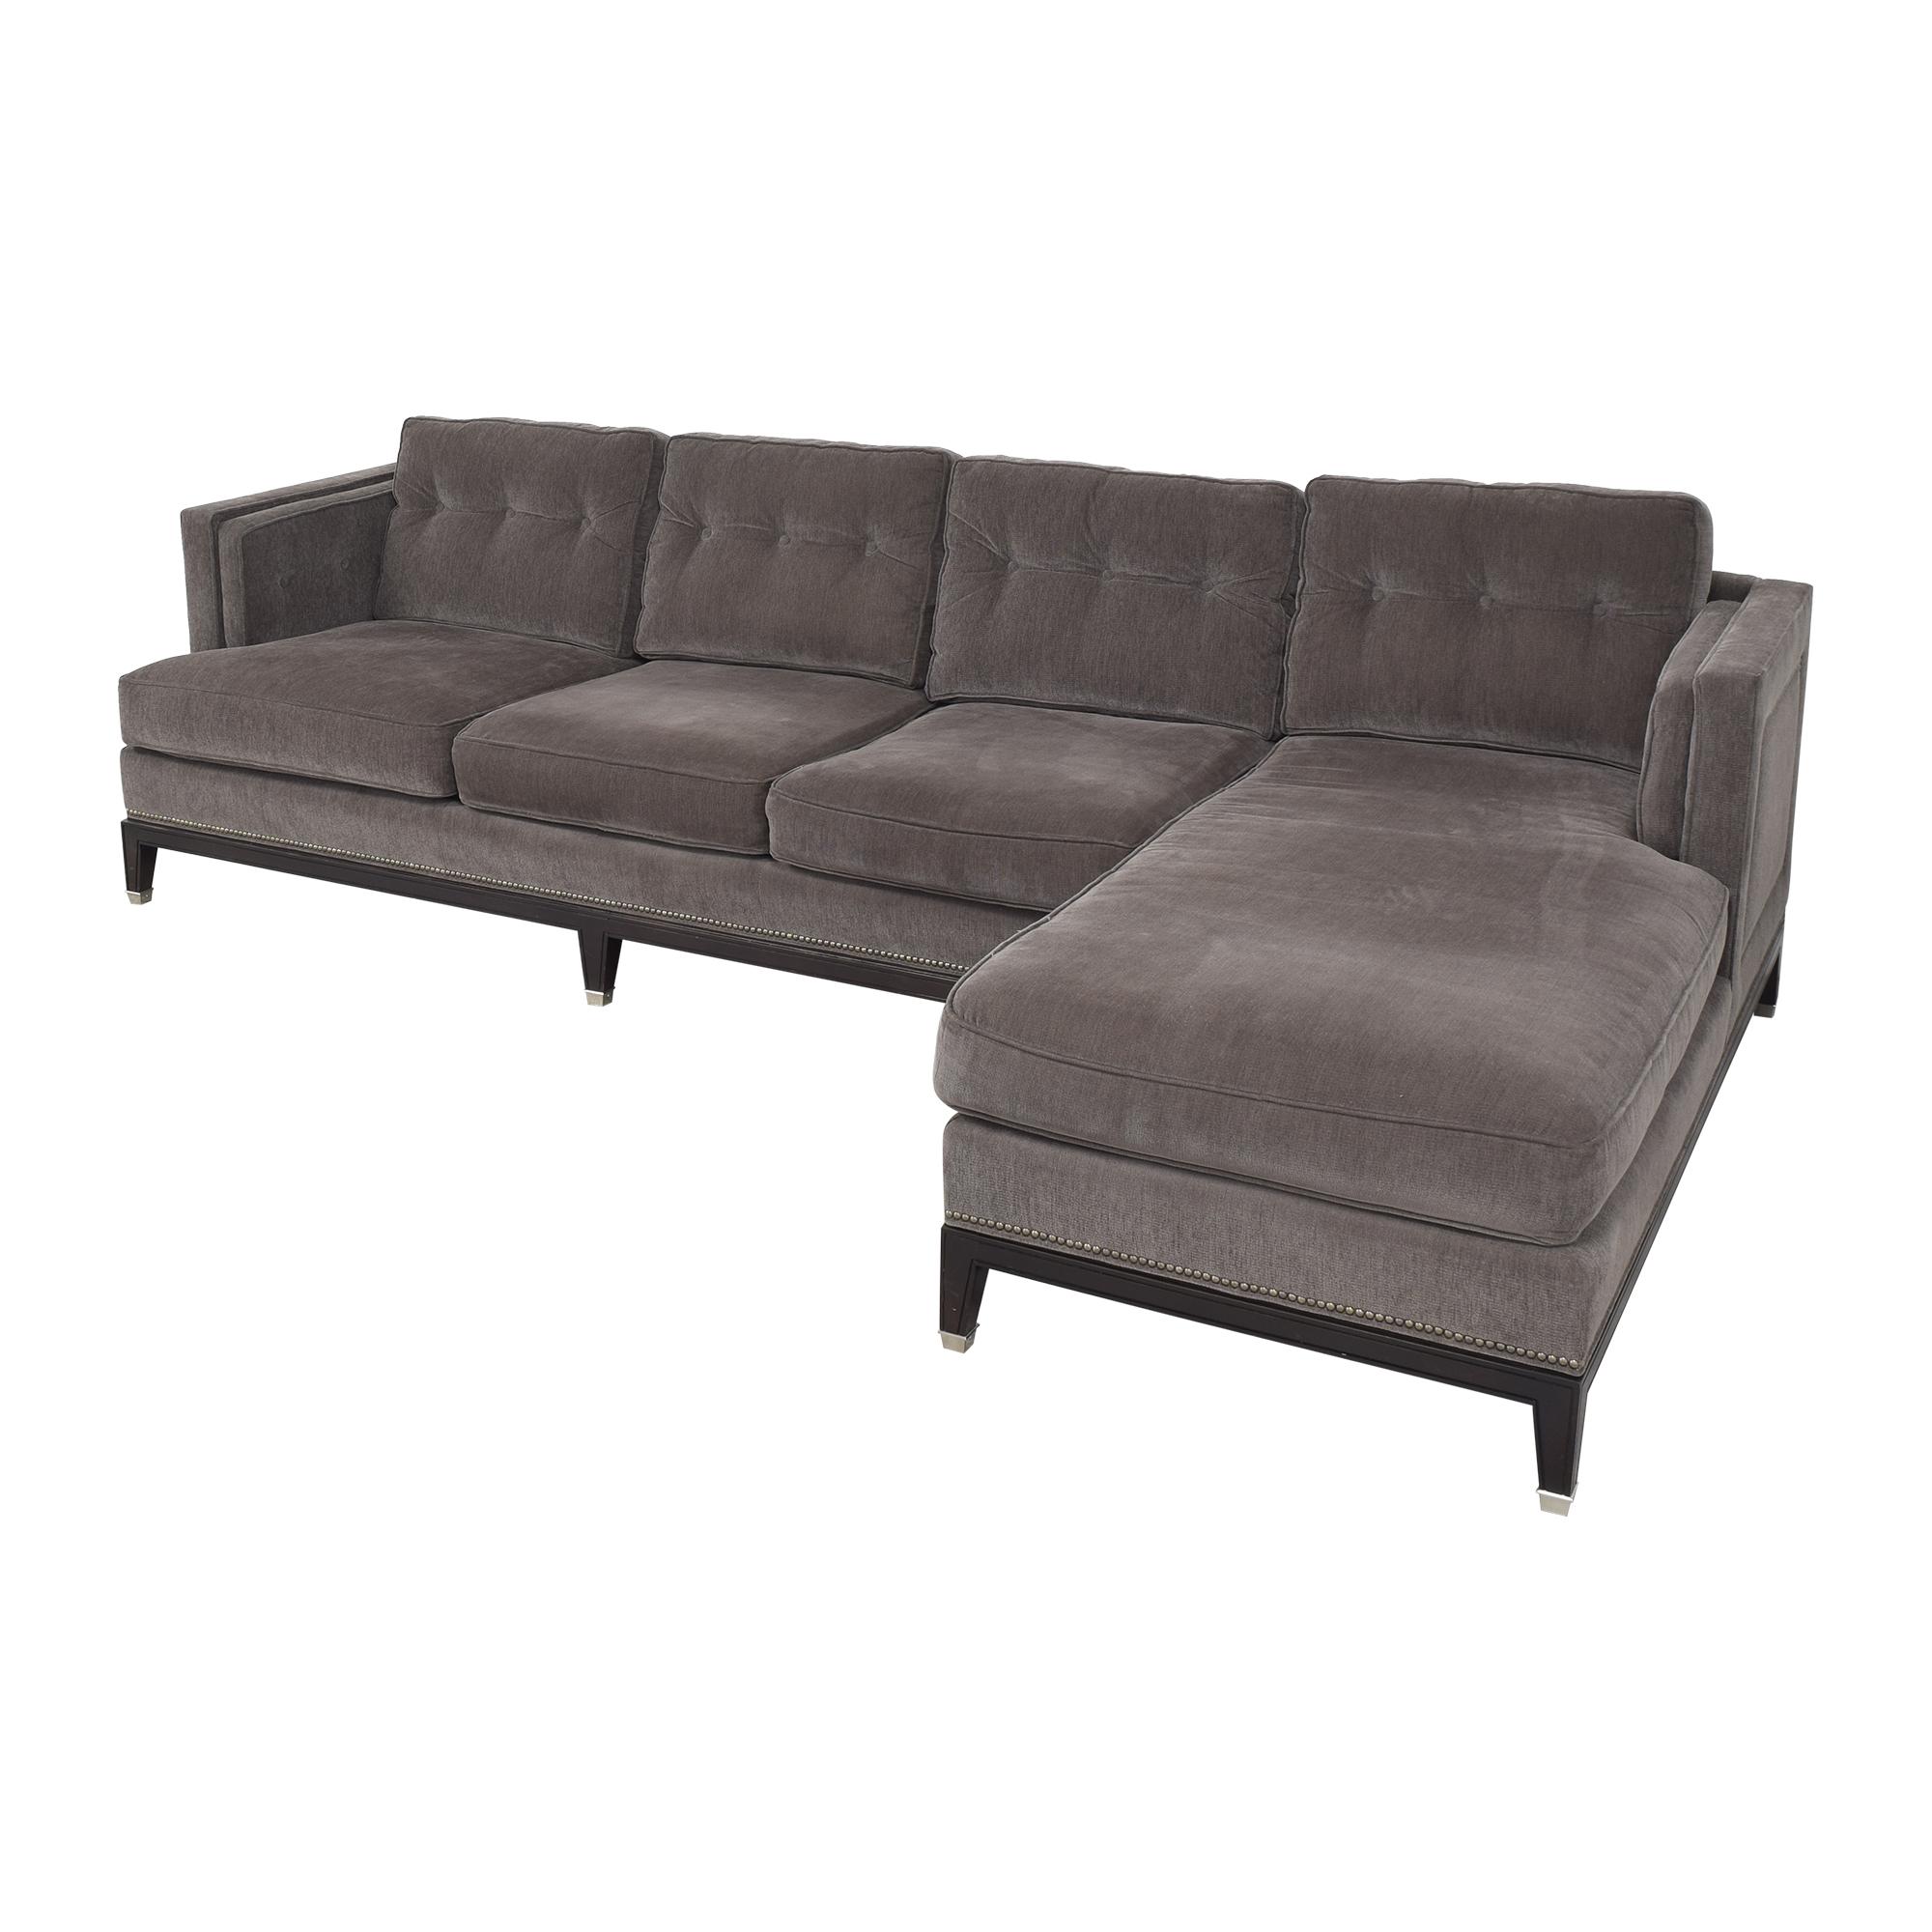 buy Vanguard Furniture Vanguard Furniture Michael Weiss Whitaker Sectional Sofa online